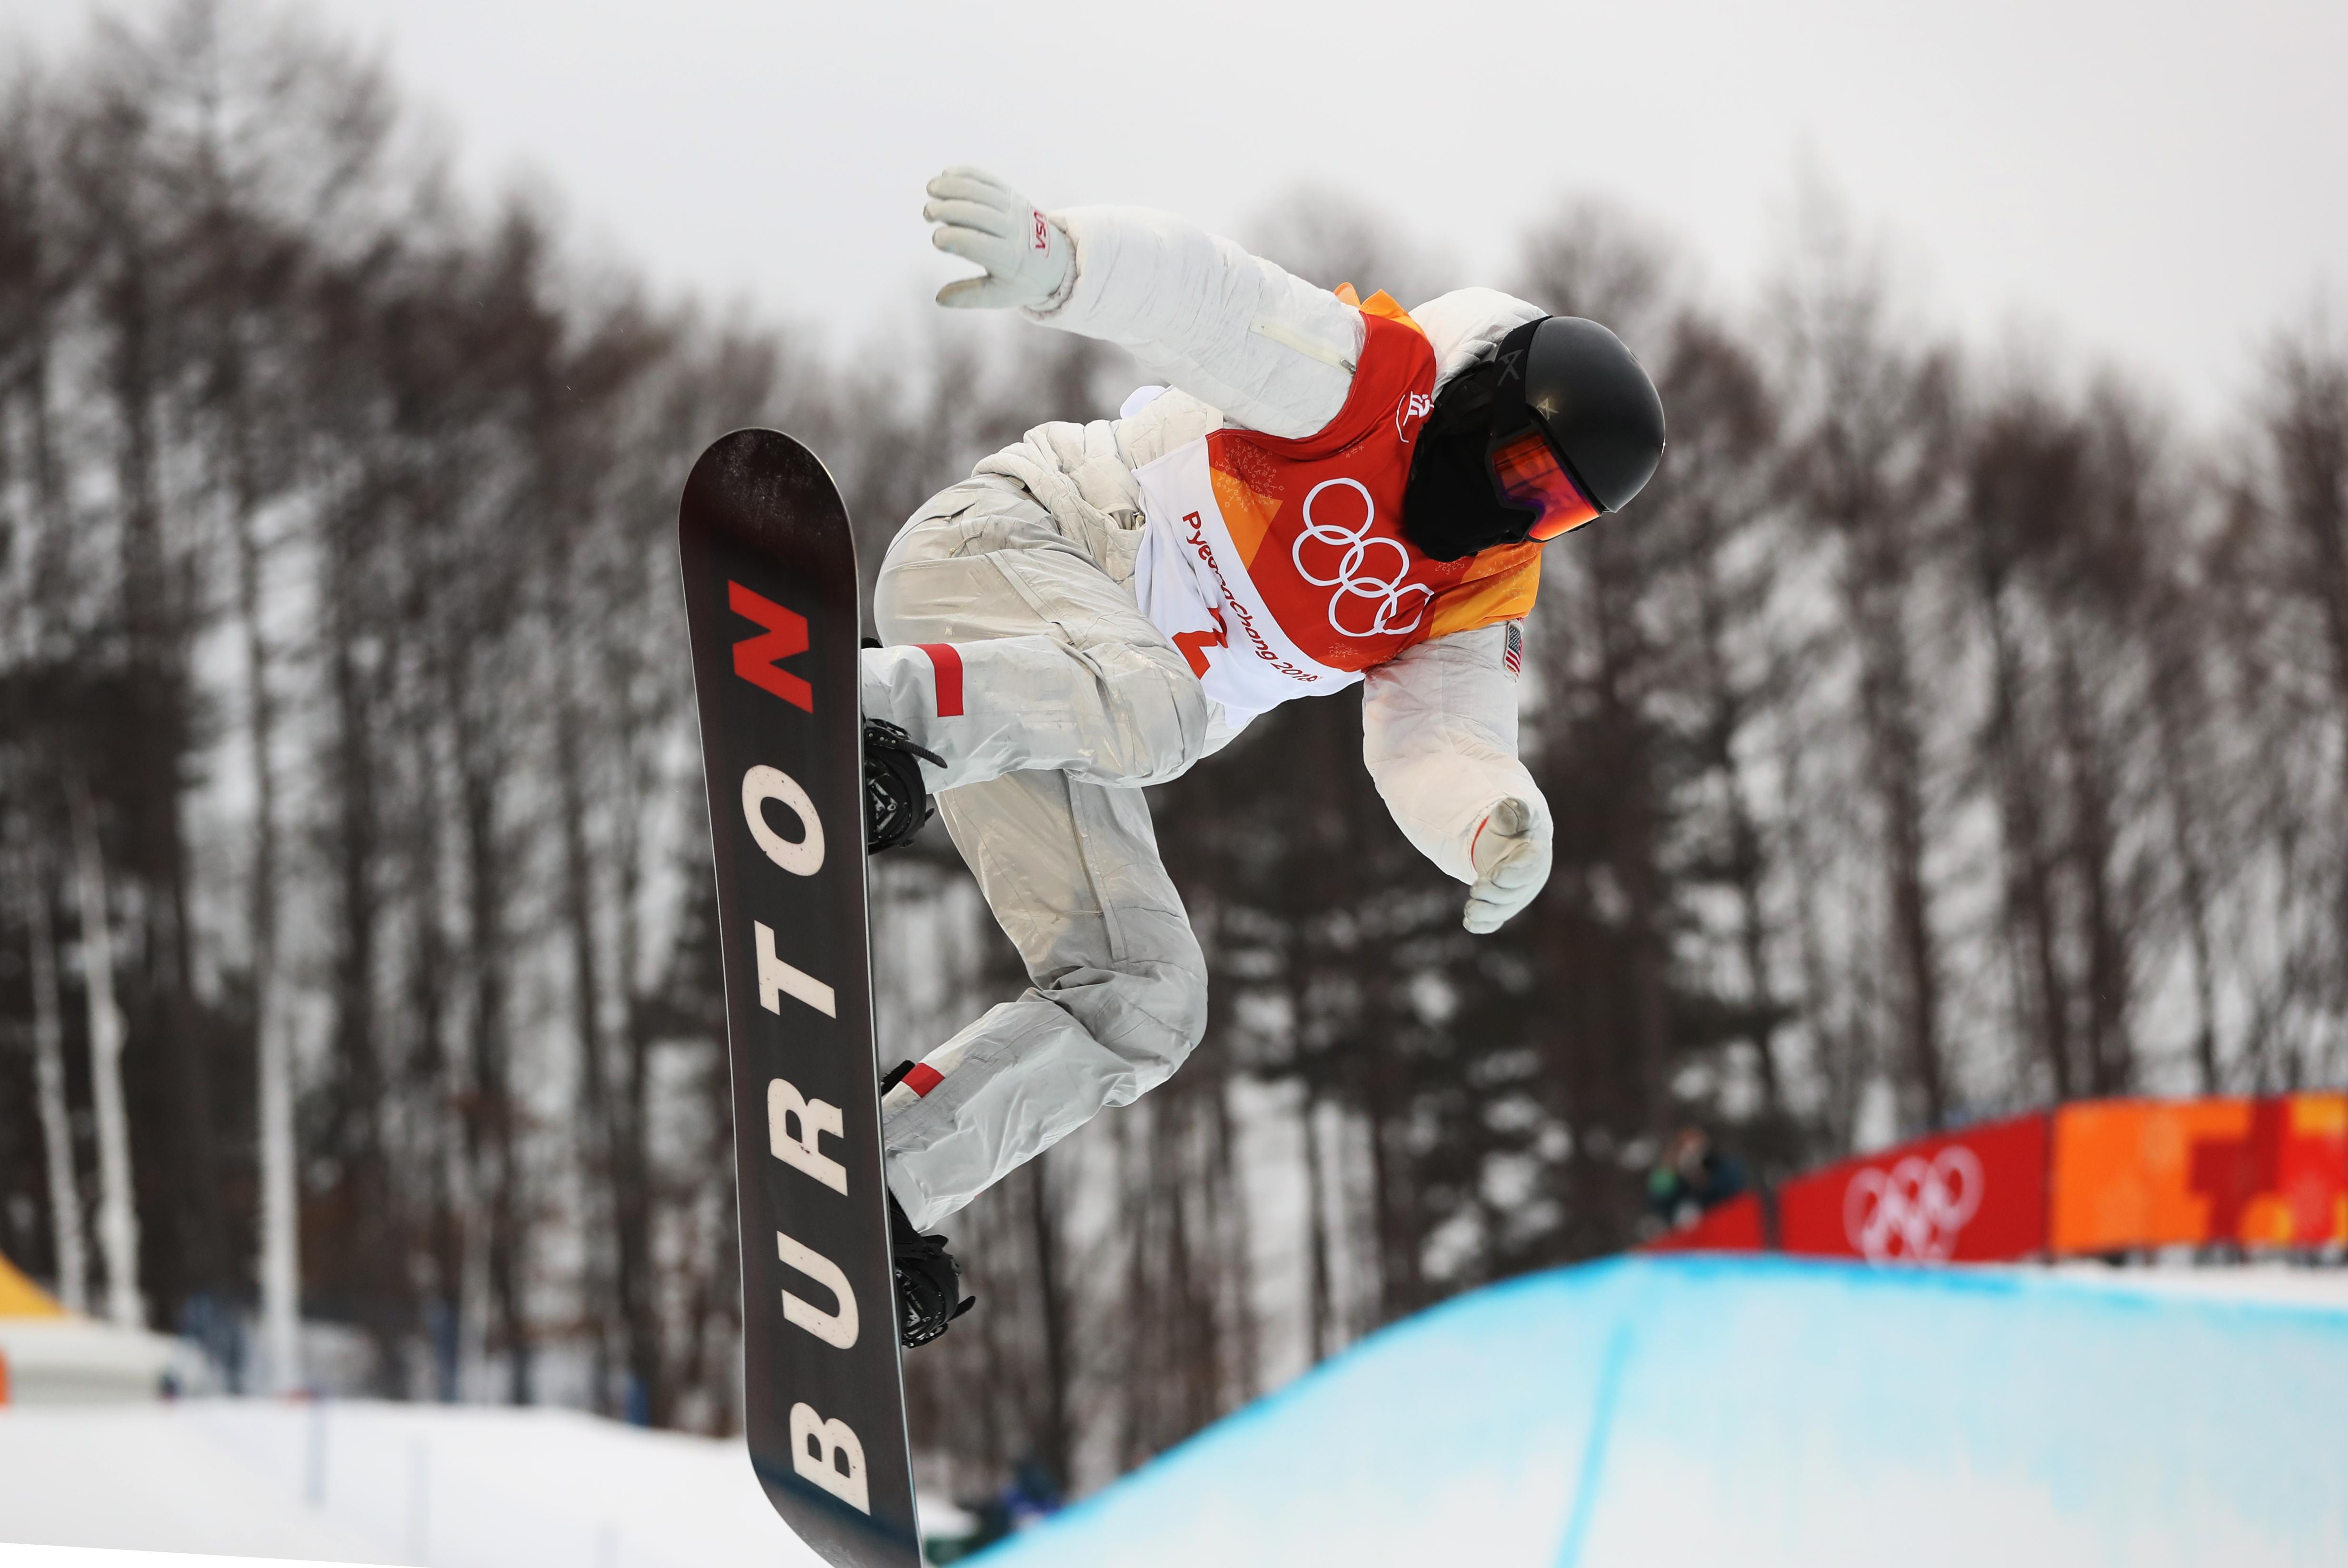 Snowboard- Winter Olympics Day 5